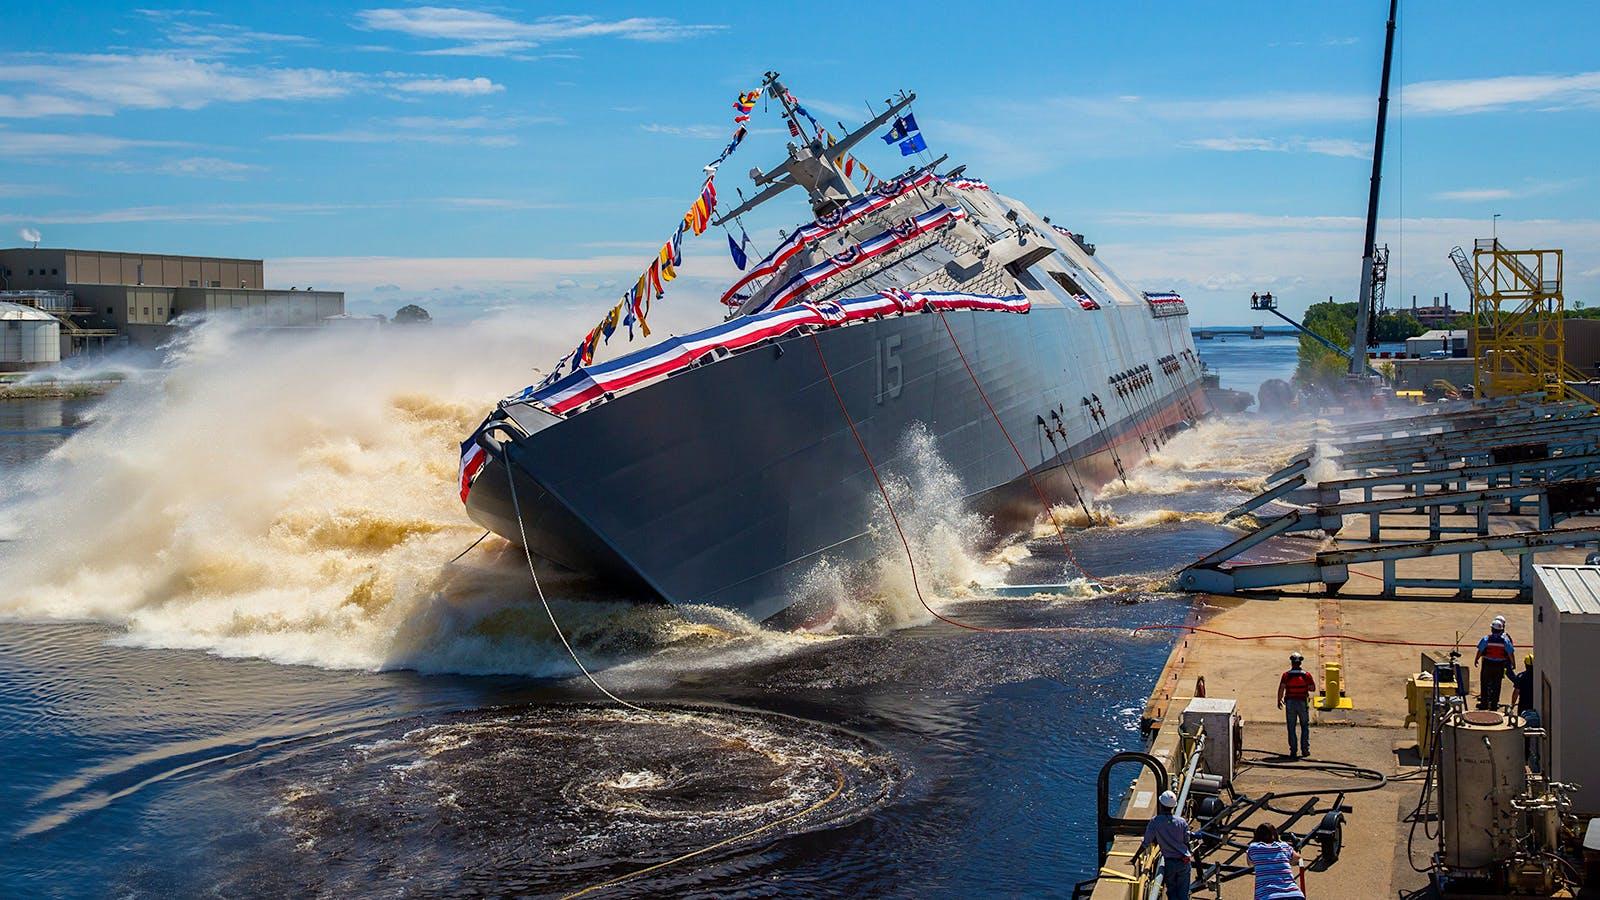 $300 Million Warship Christened with $8 Wine